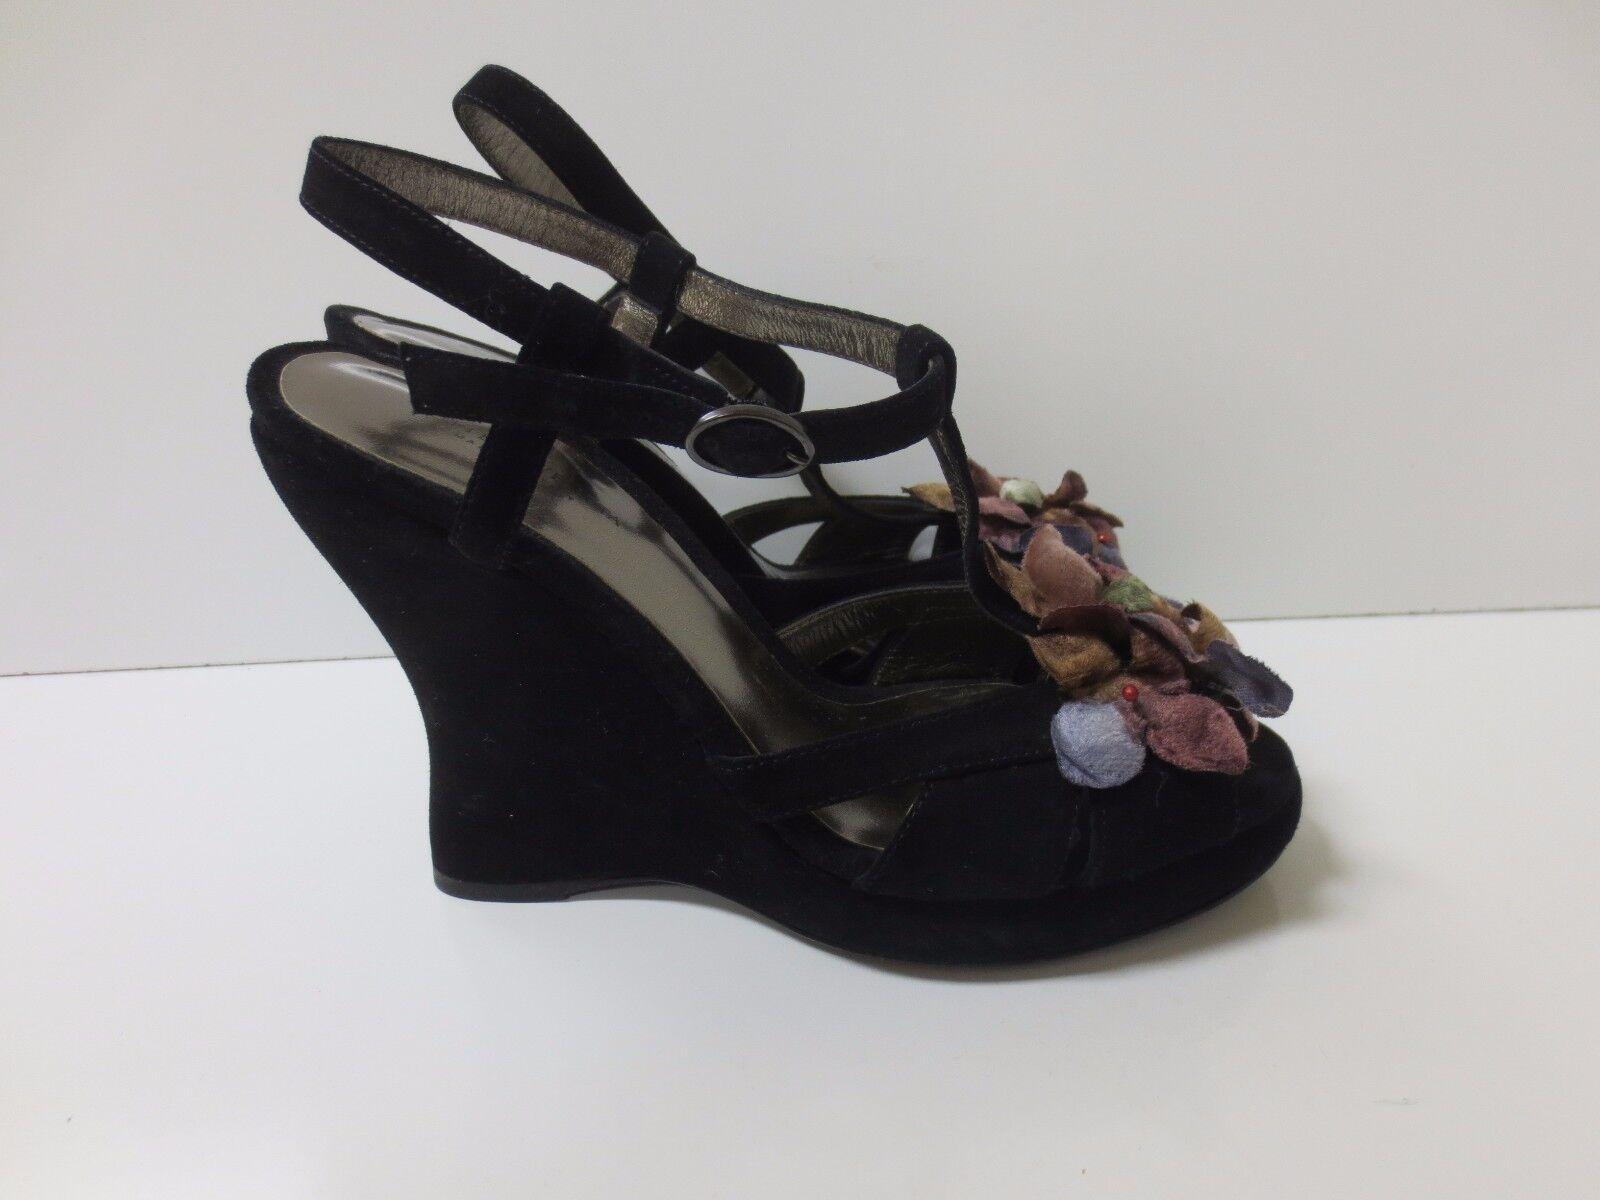 BOTTEGA VENETA nero Suede T-Strap Sandals Wedge Heels Heels Heels 36 Worn Once 13058e